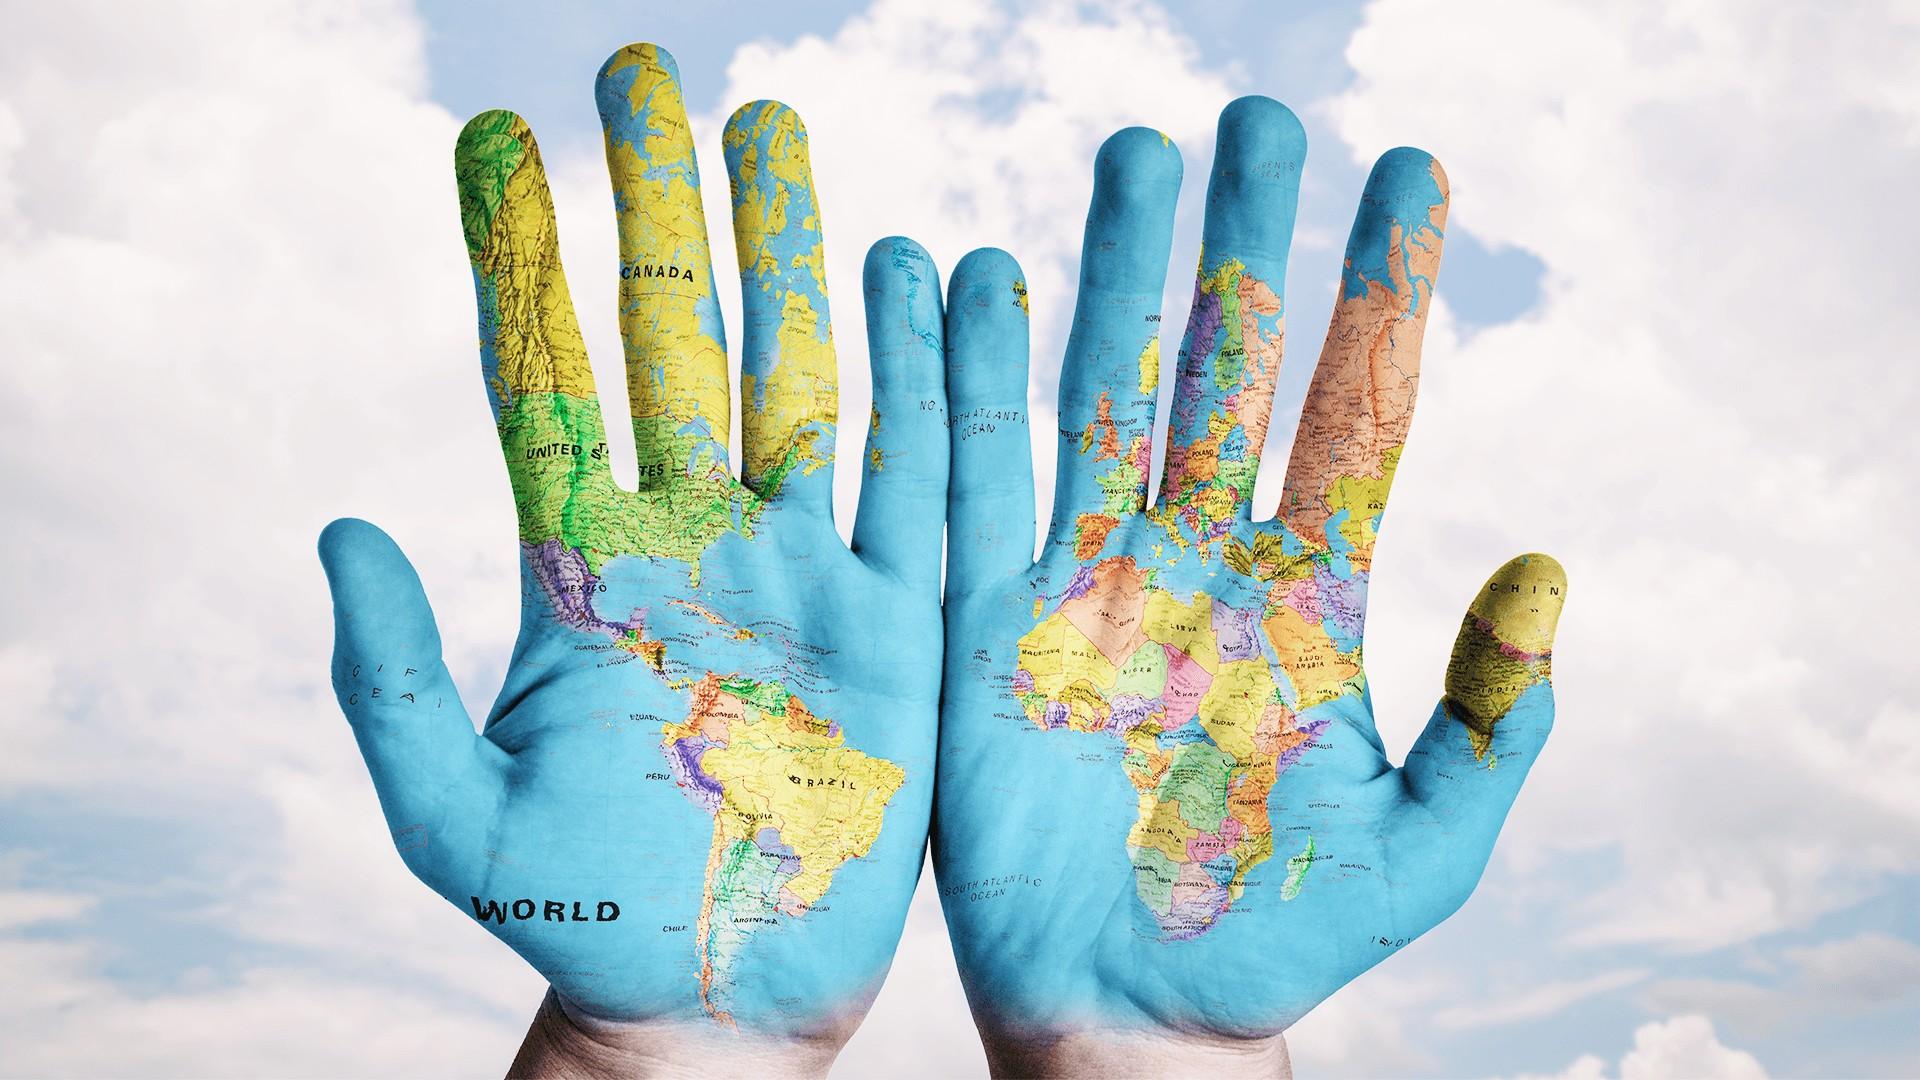 world-hand-linkedin-location